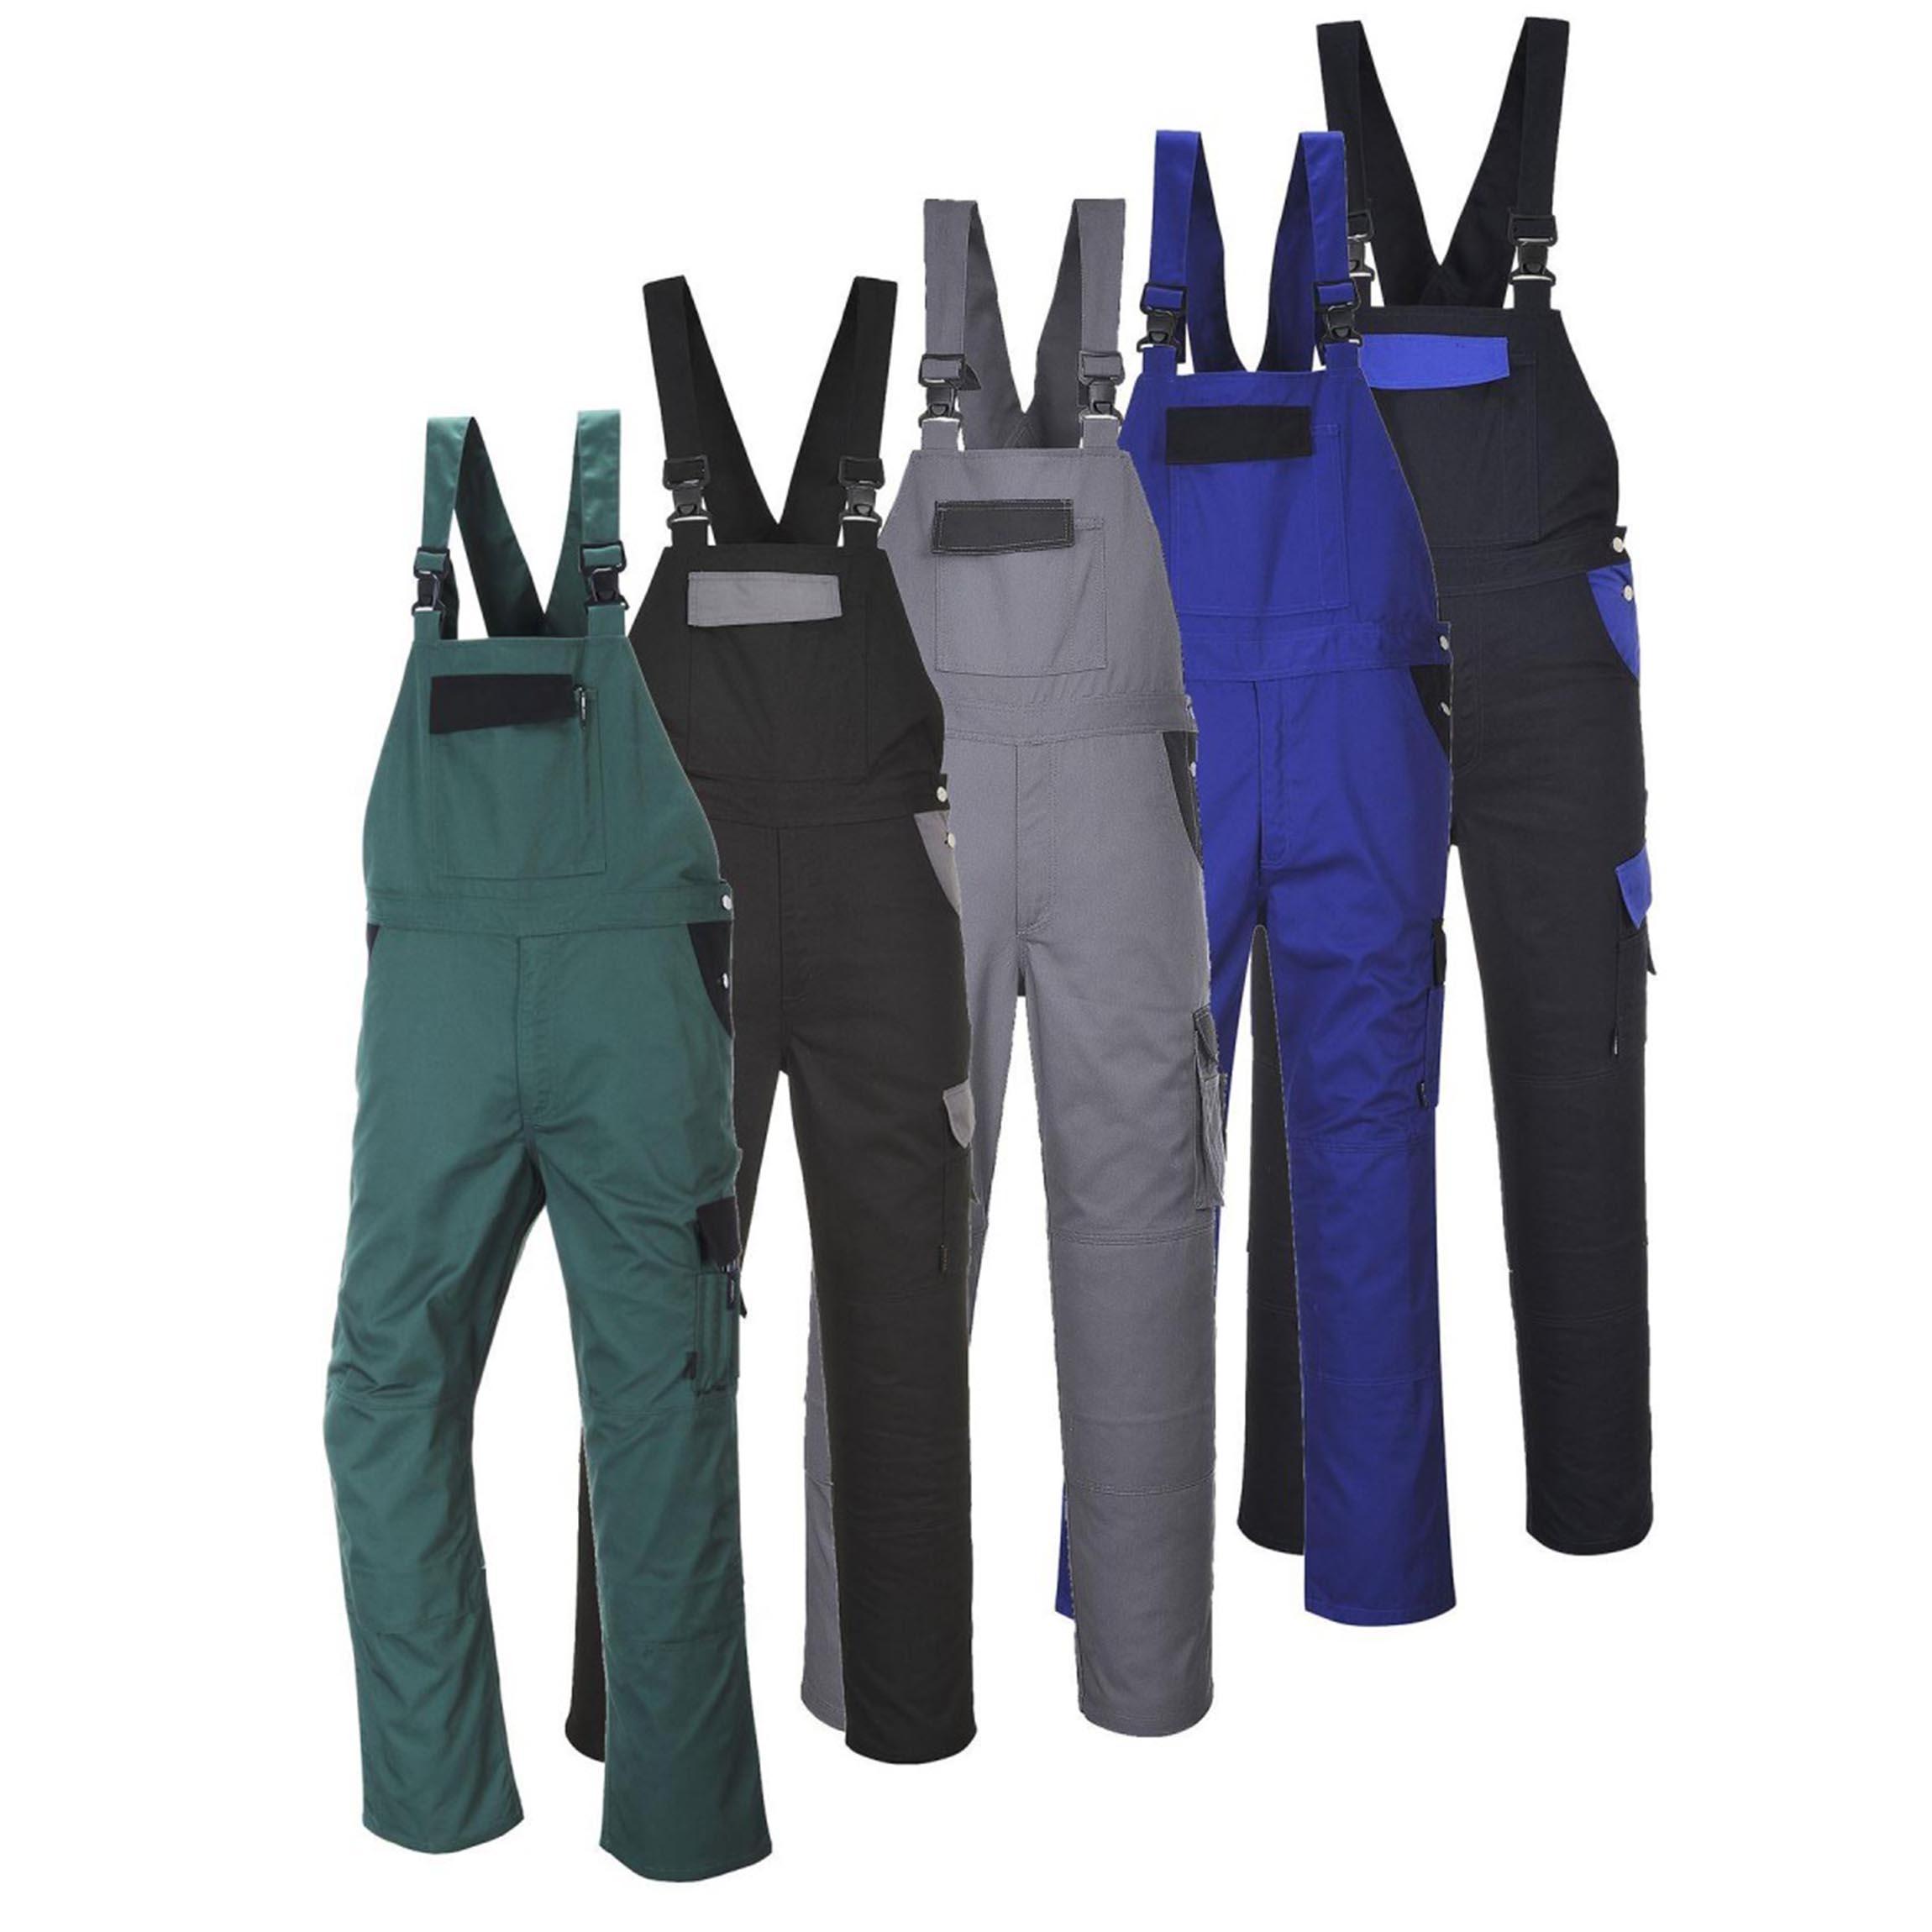 Radne hlače s naramenicama TX39